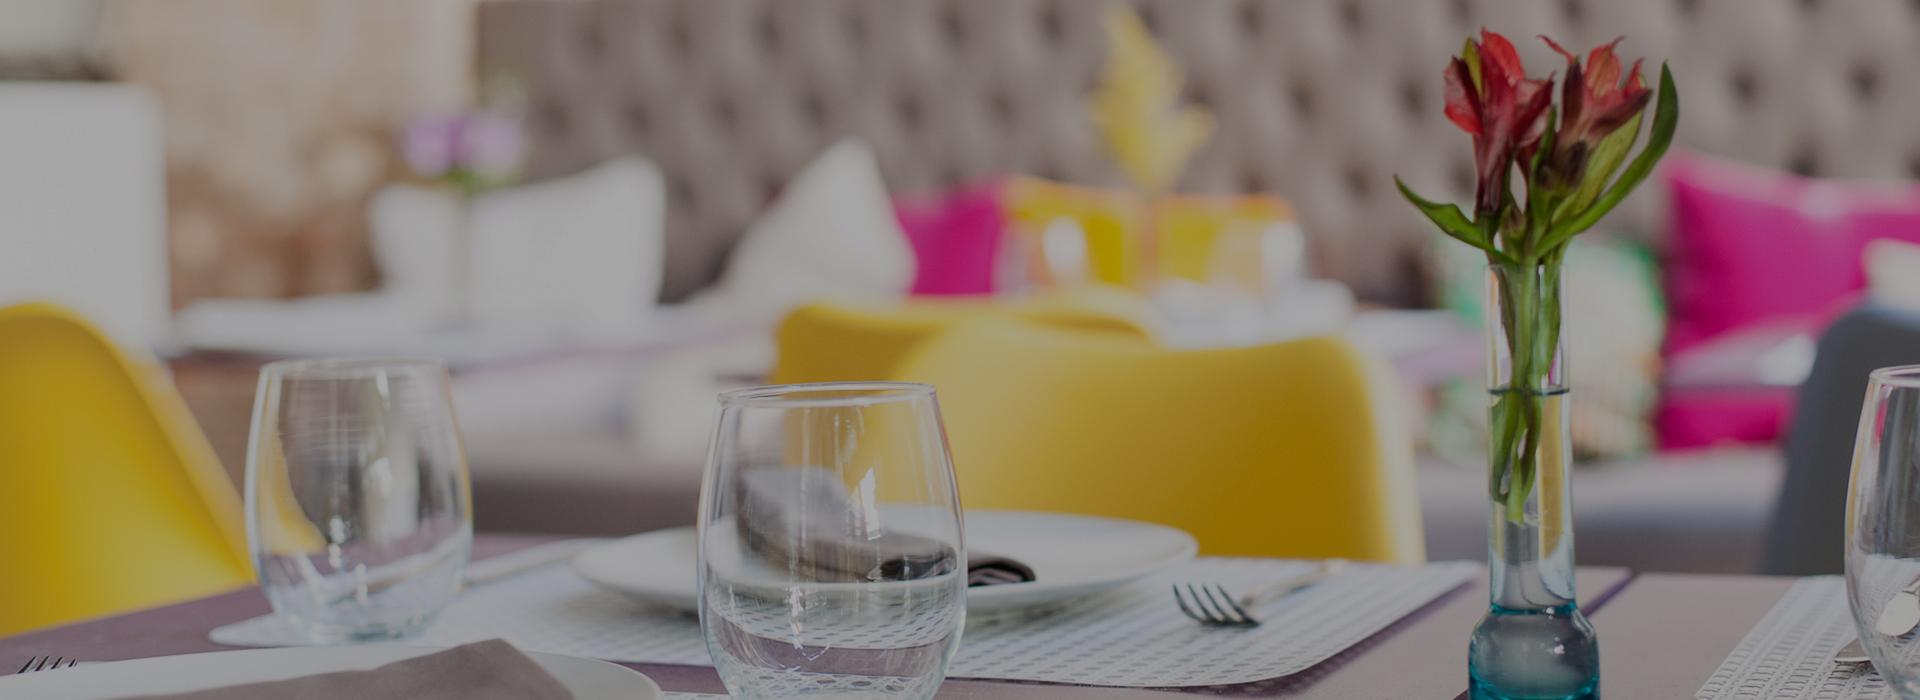 Identidad Corporativa Restaurante La Milagrosa